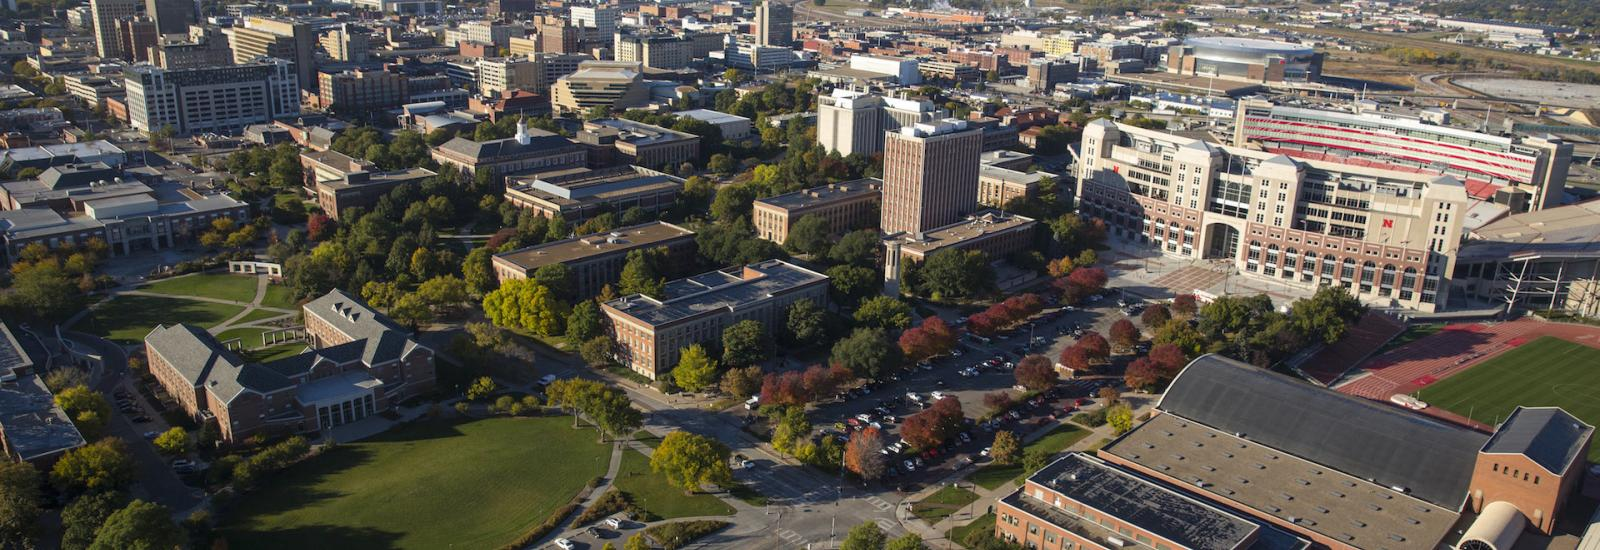 Human Resources University Of Nebraska Lincoln